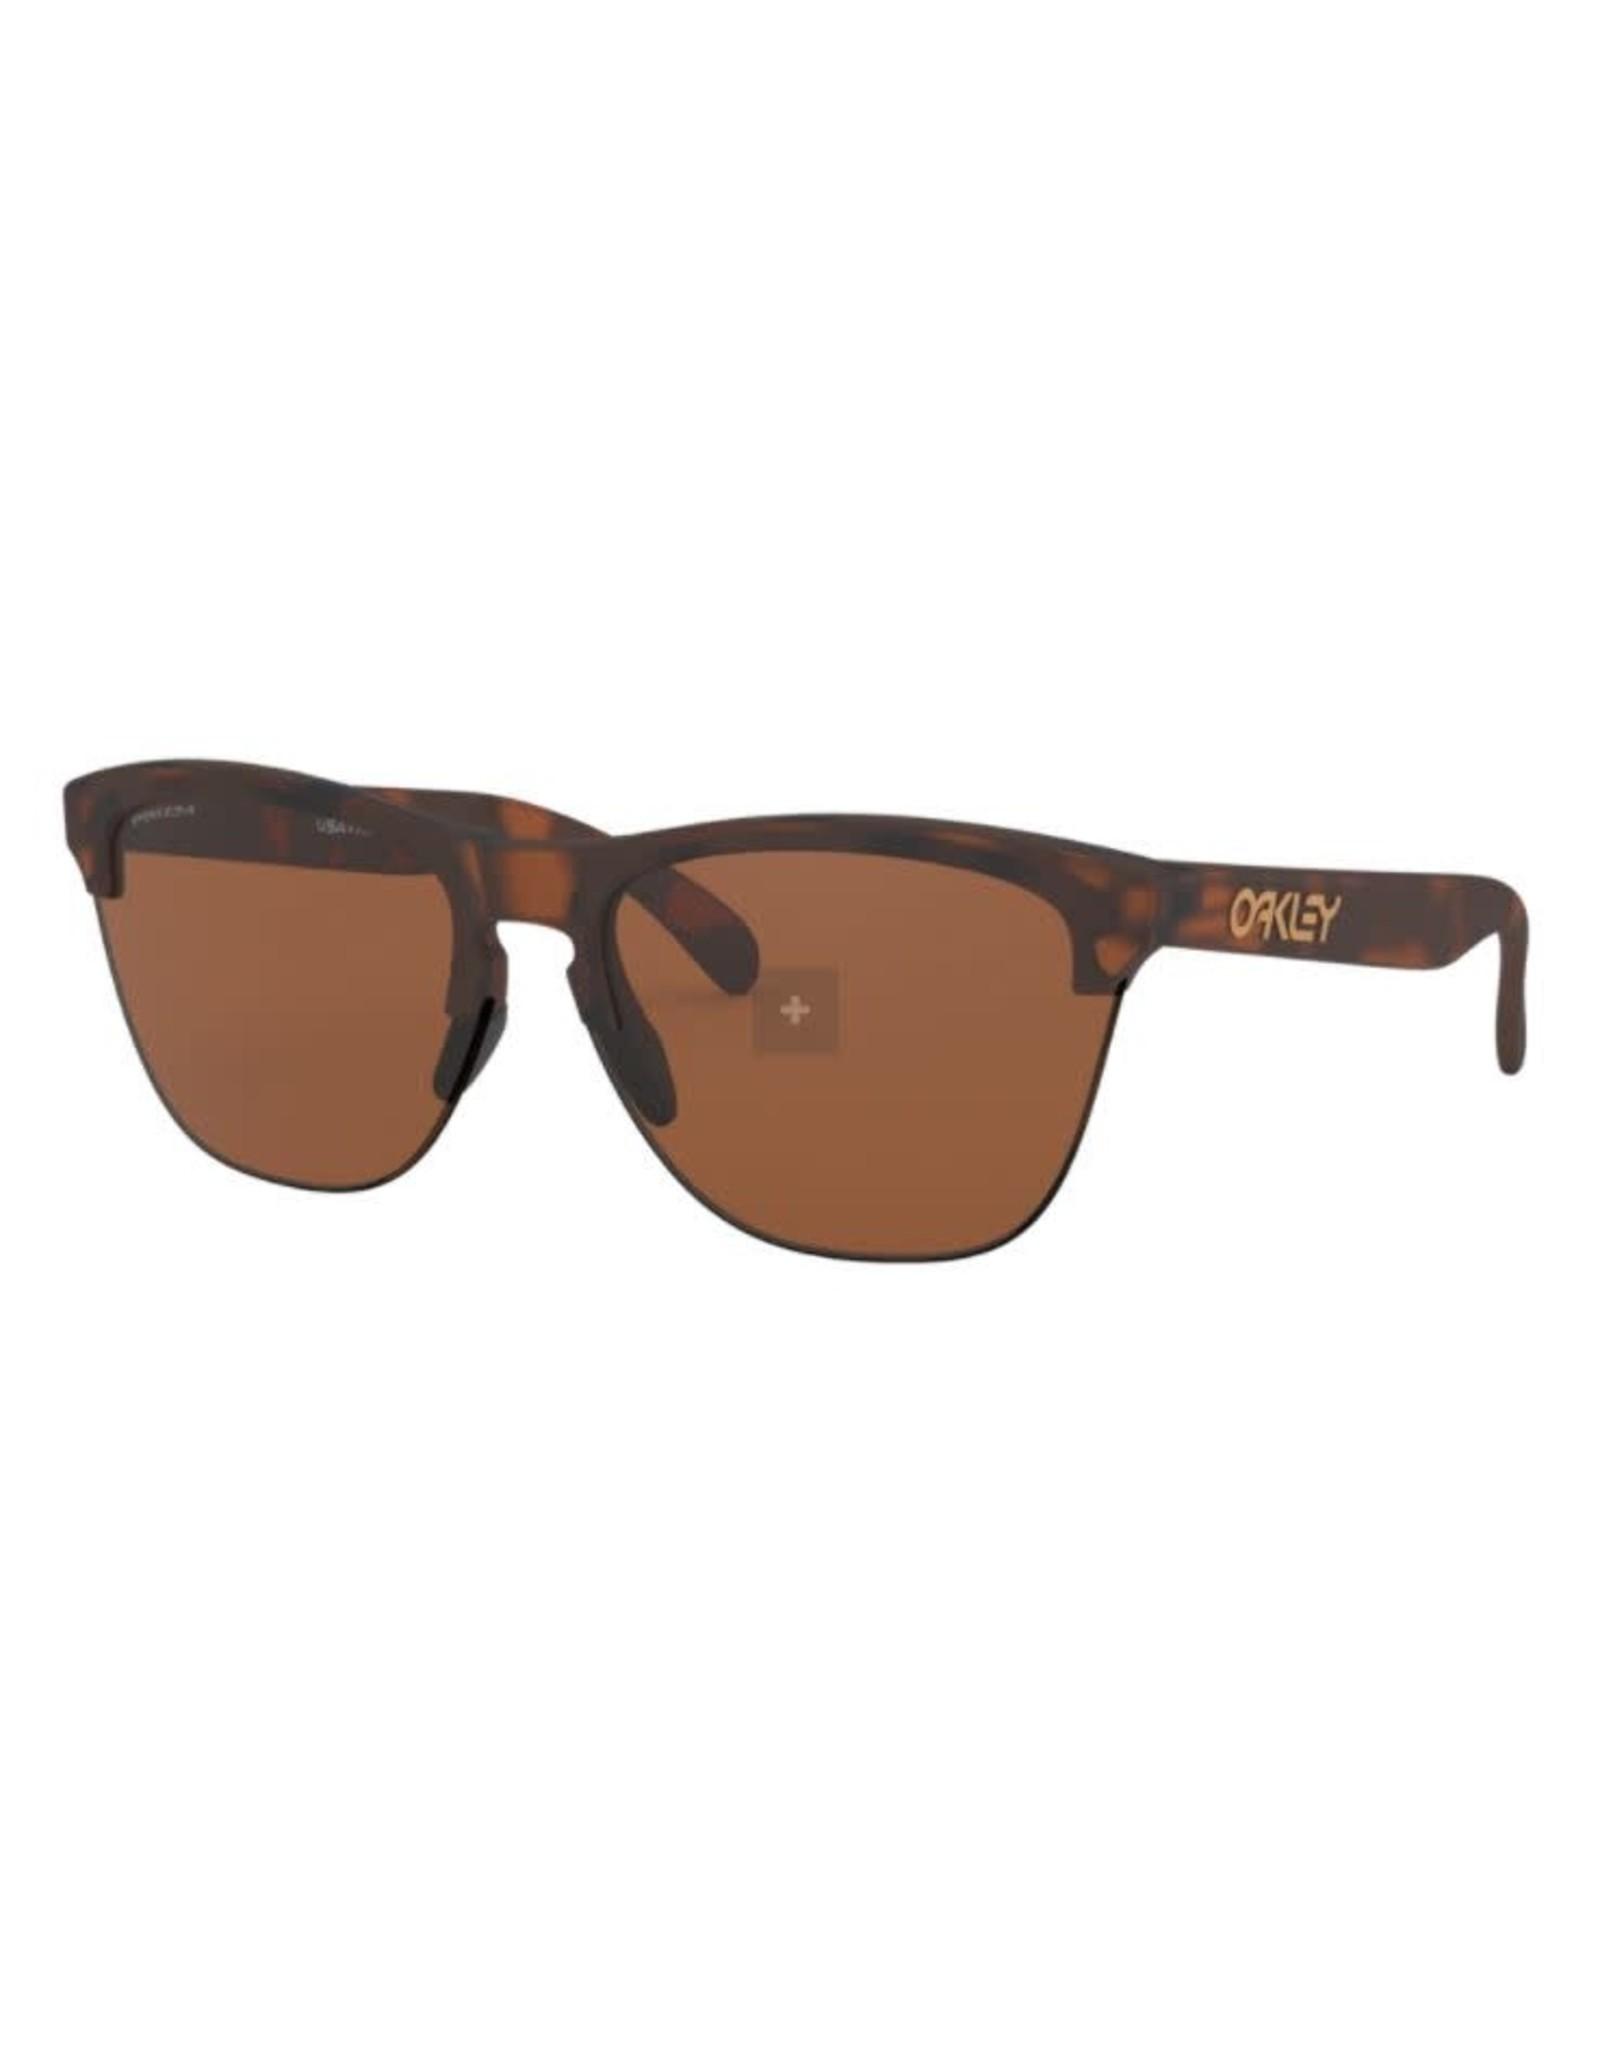 Oakley Oakley - Lunette soleil homme frogskins lite matte brown tortoise/lens prizm tungsten